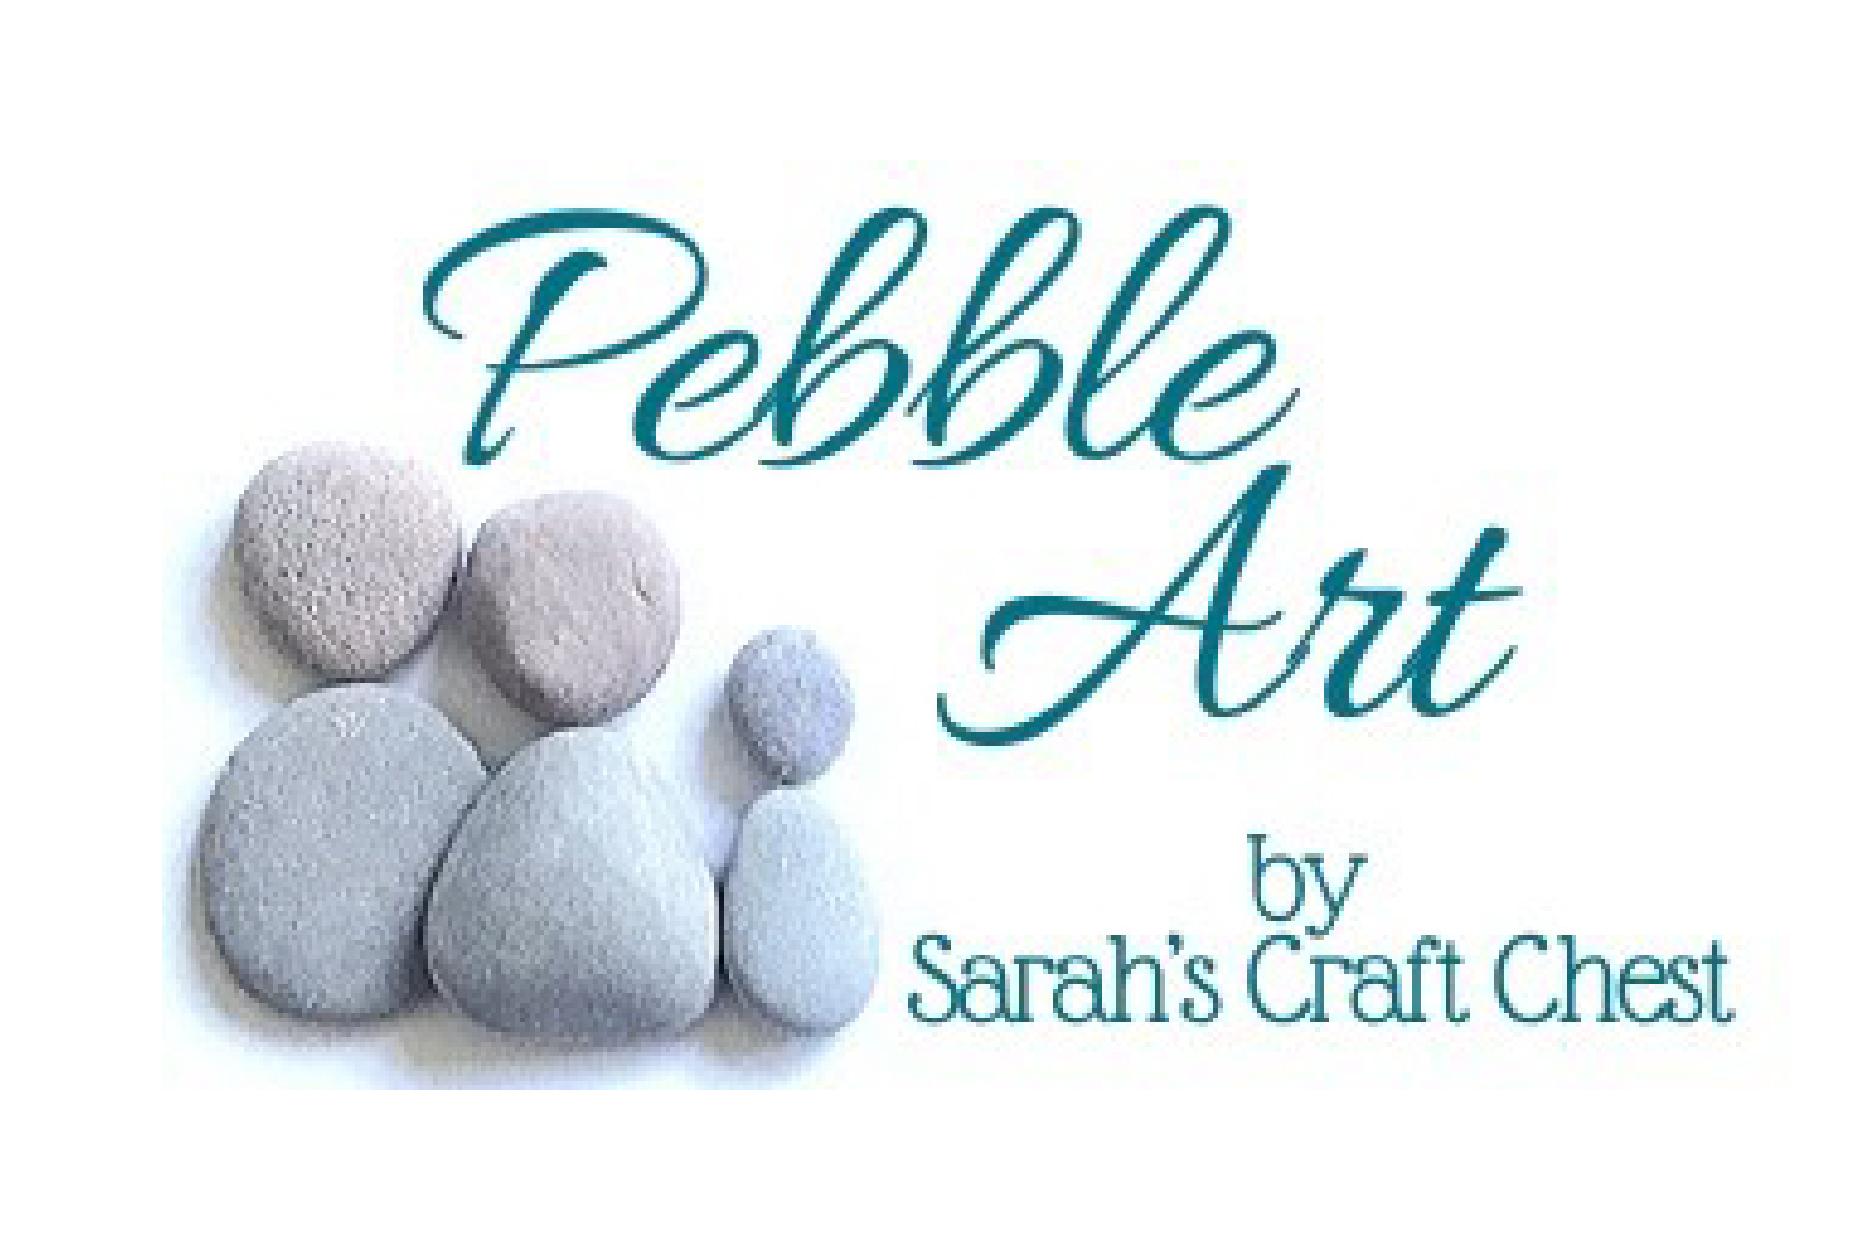 Sarah's Craft Chest